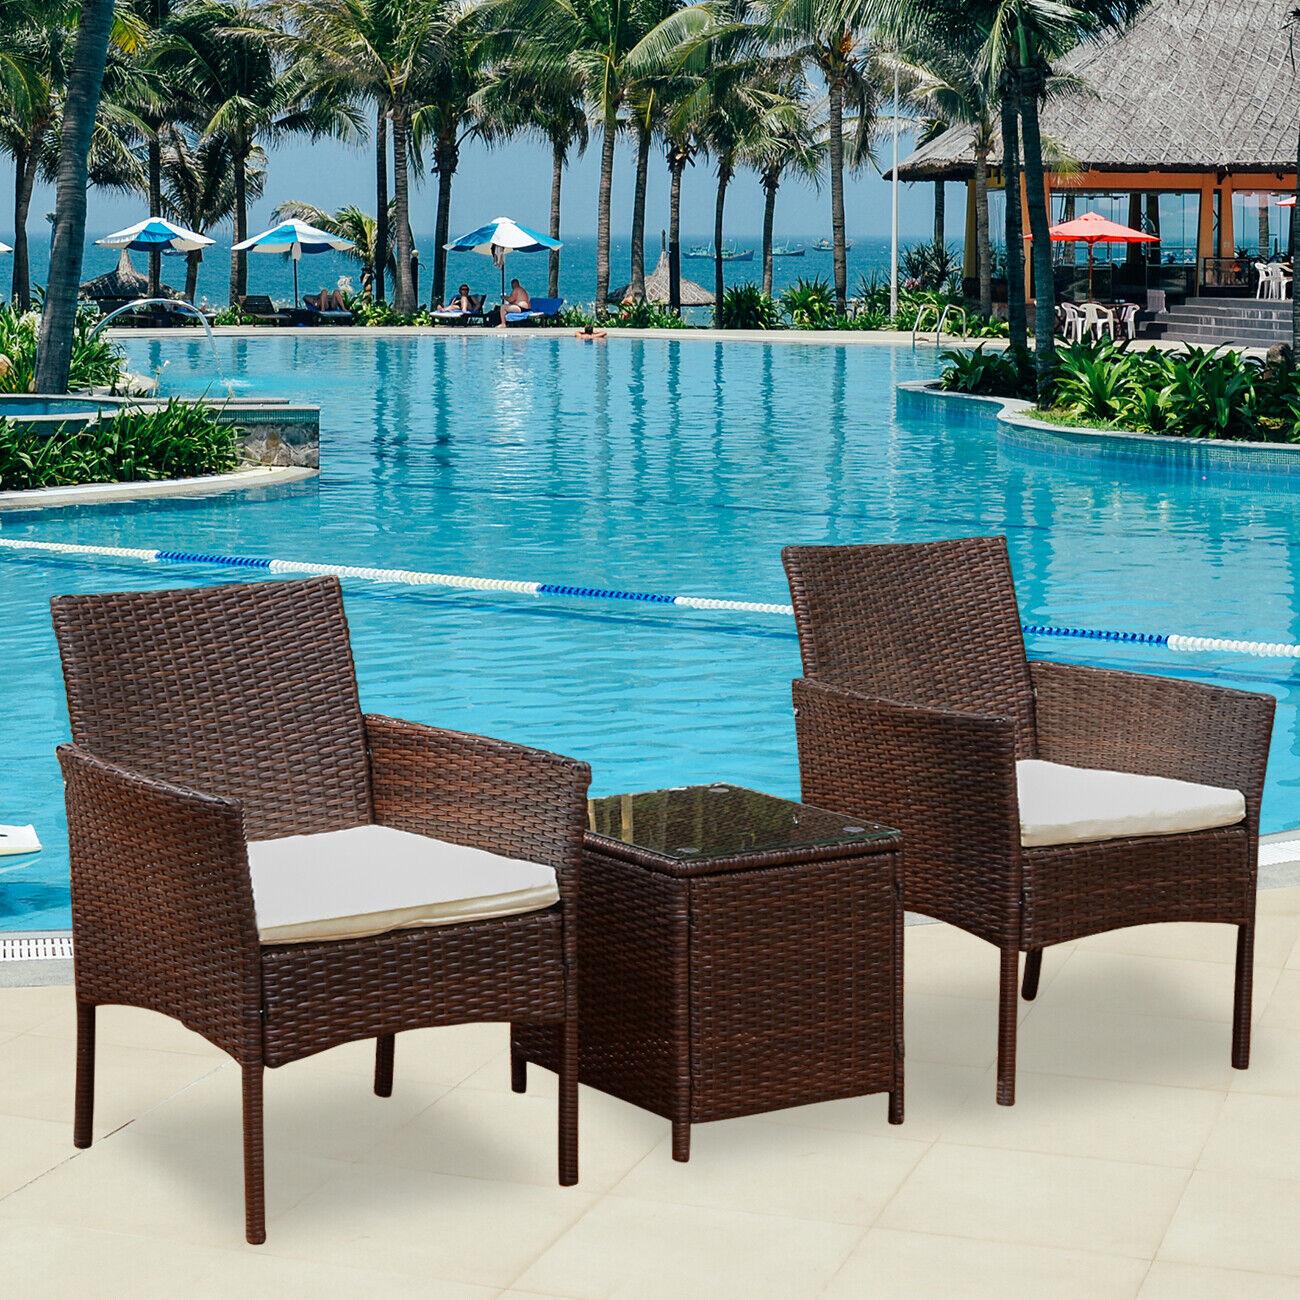 Garden Furniture - Rattan Garden Furniture Set 3 Piece Chairs Sofa Table Outdoor Patio Set Brown